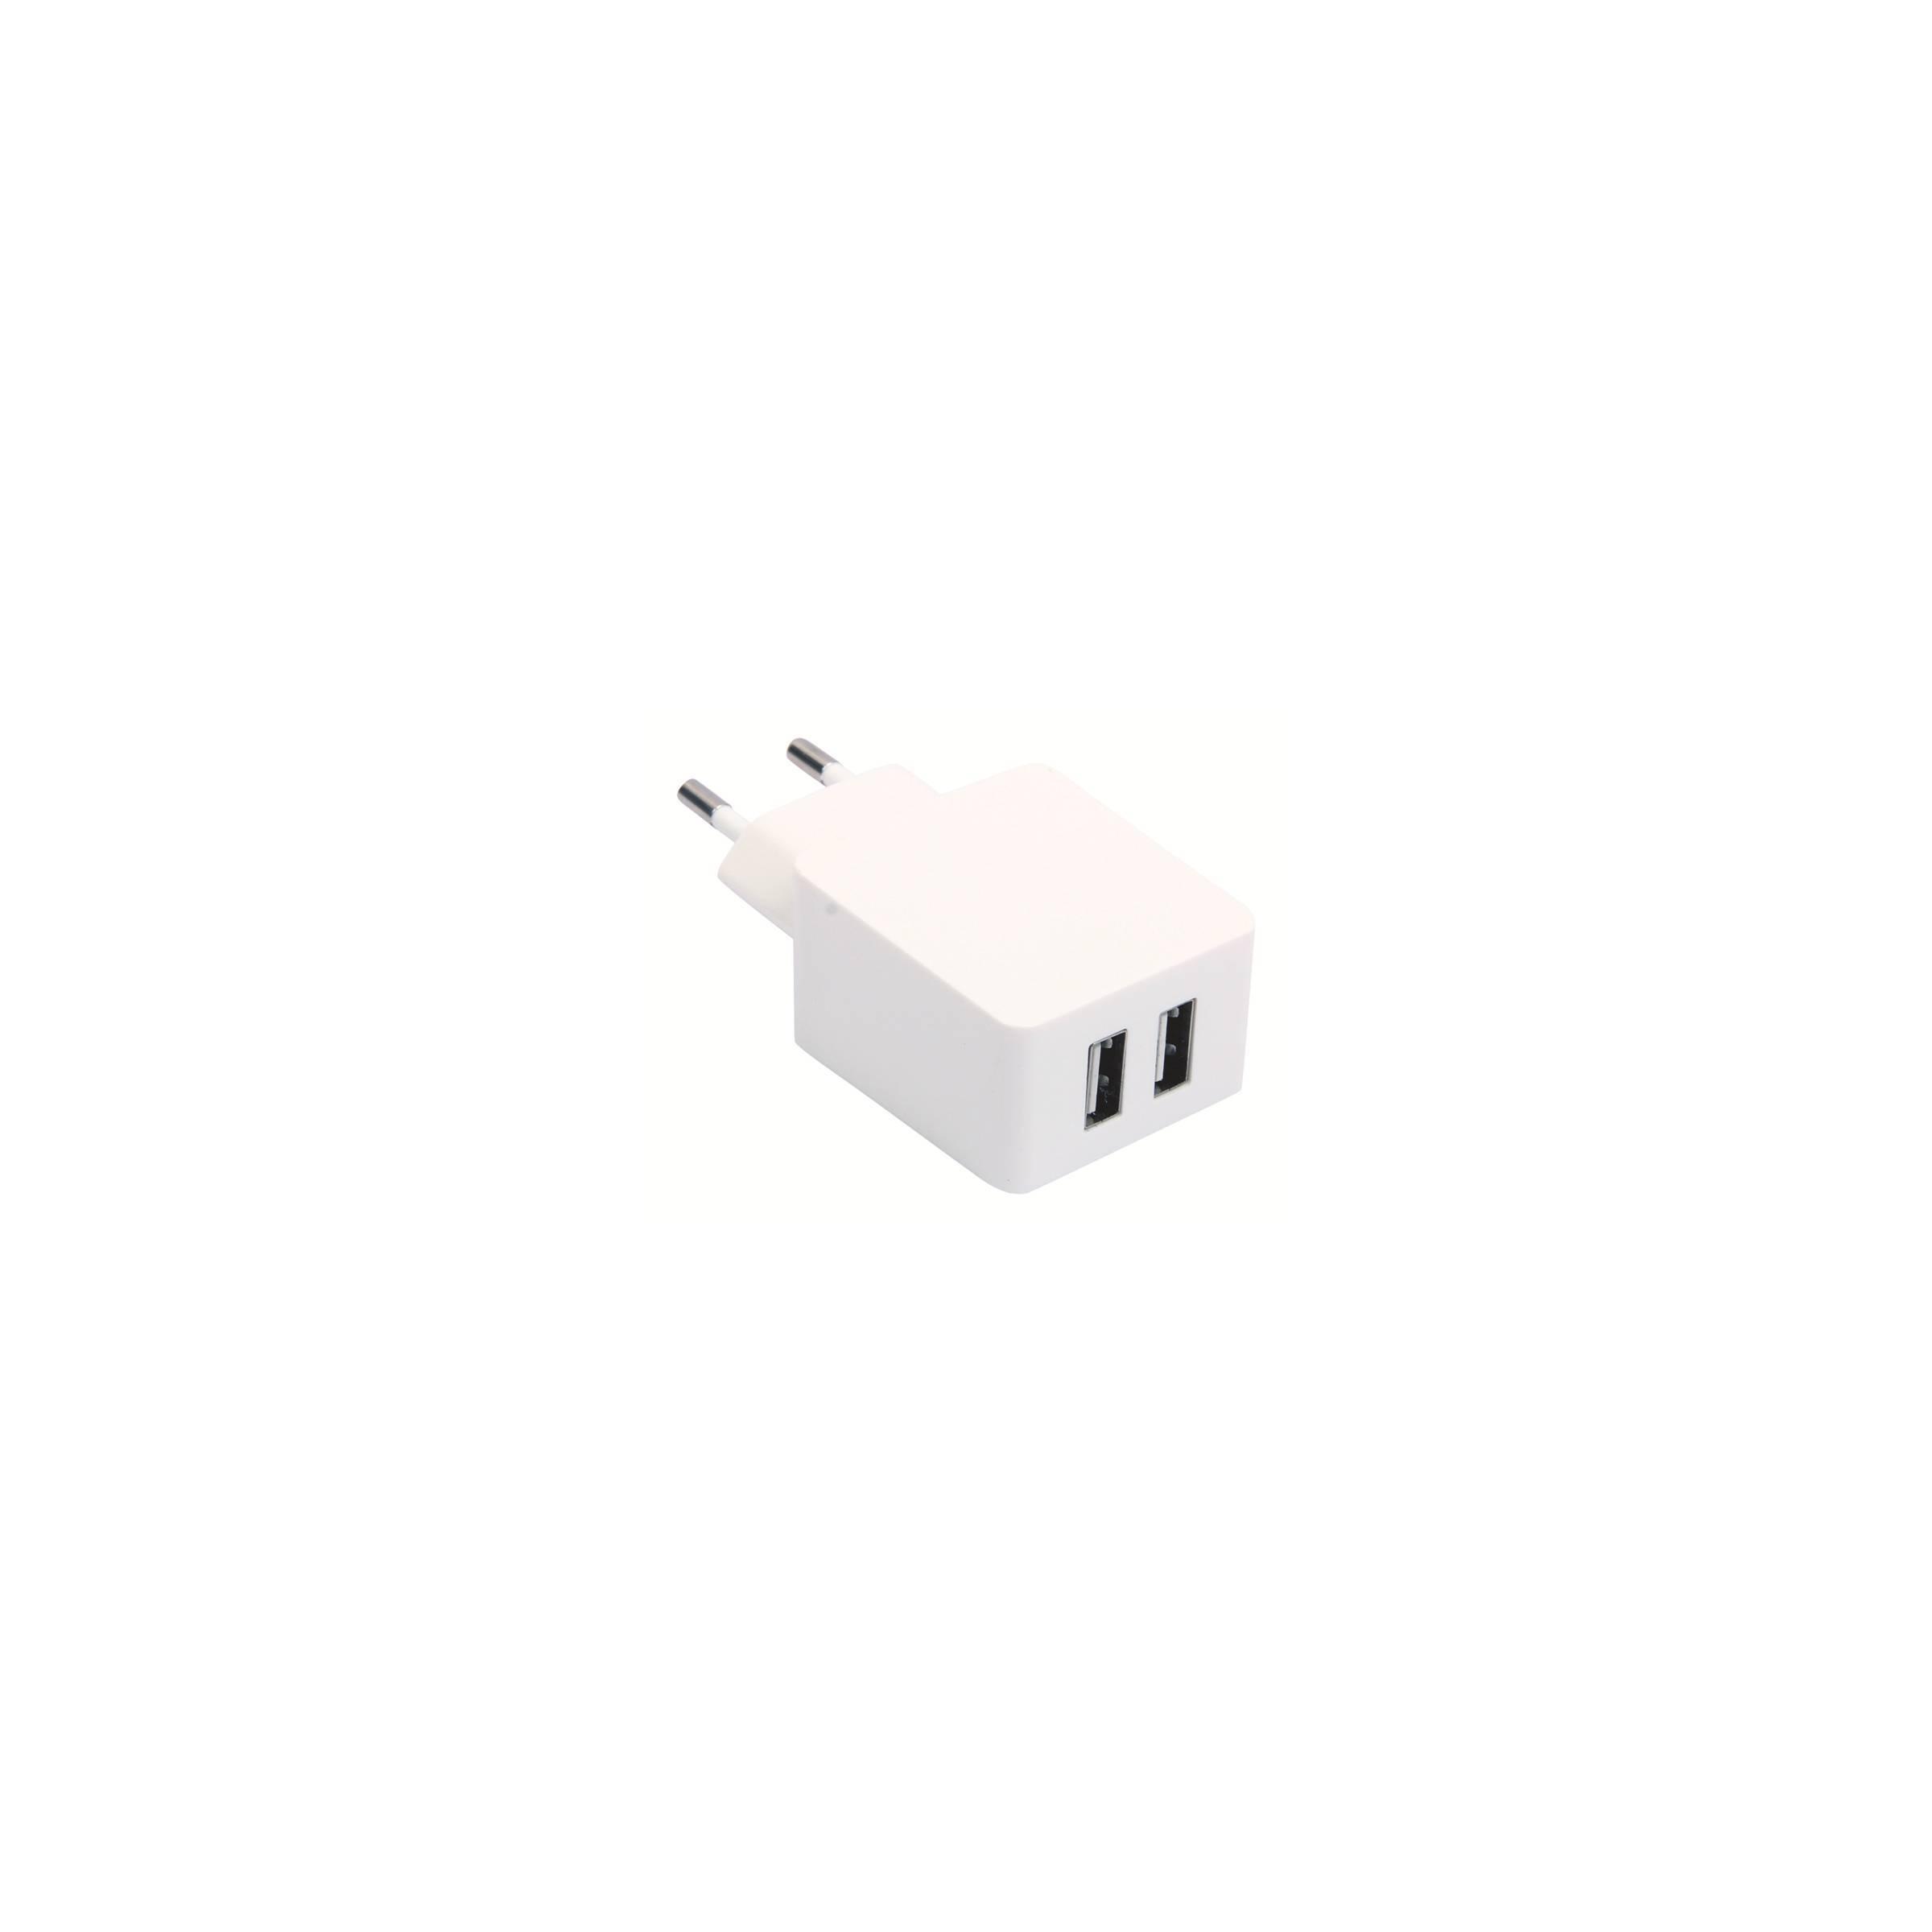 sinox – Sinox i-media 2xusb oplader til iphone/ipad 10w fra mackabler.dk